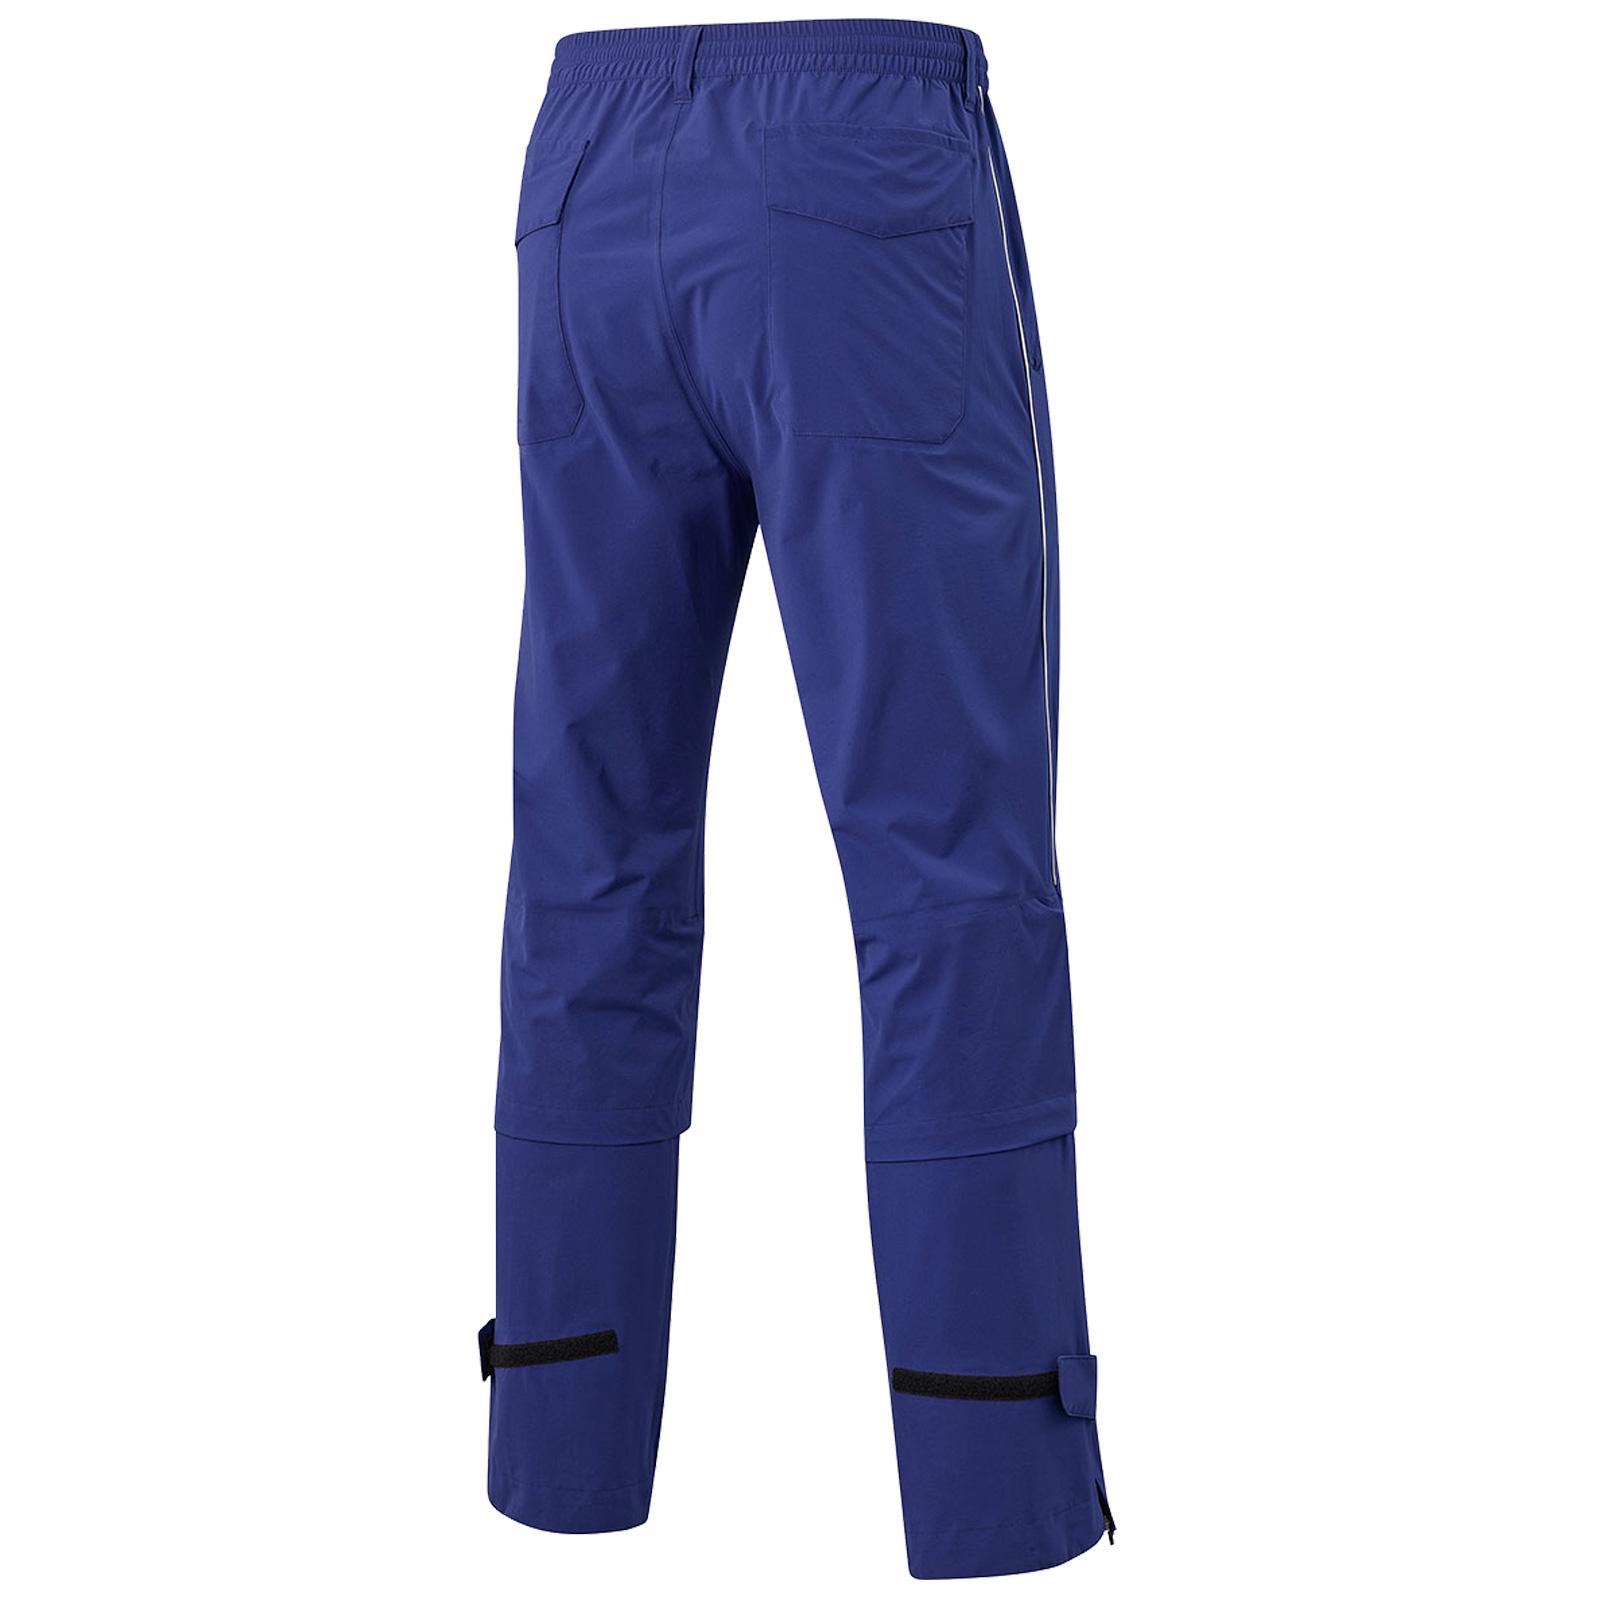 Mizuno-Mens-Impermalite-F20-Waterproof-Rain-Trousers-Lightweight-Golf-Pant thumbnail 5